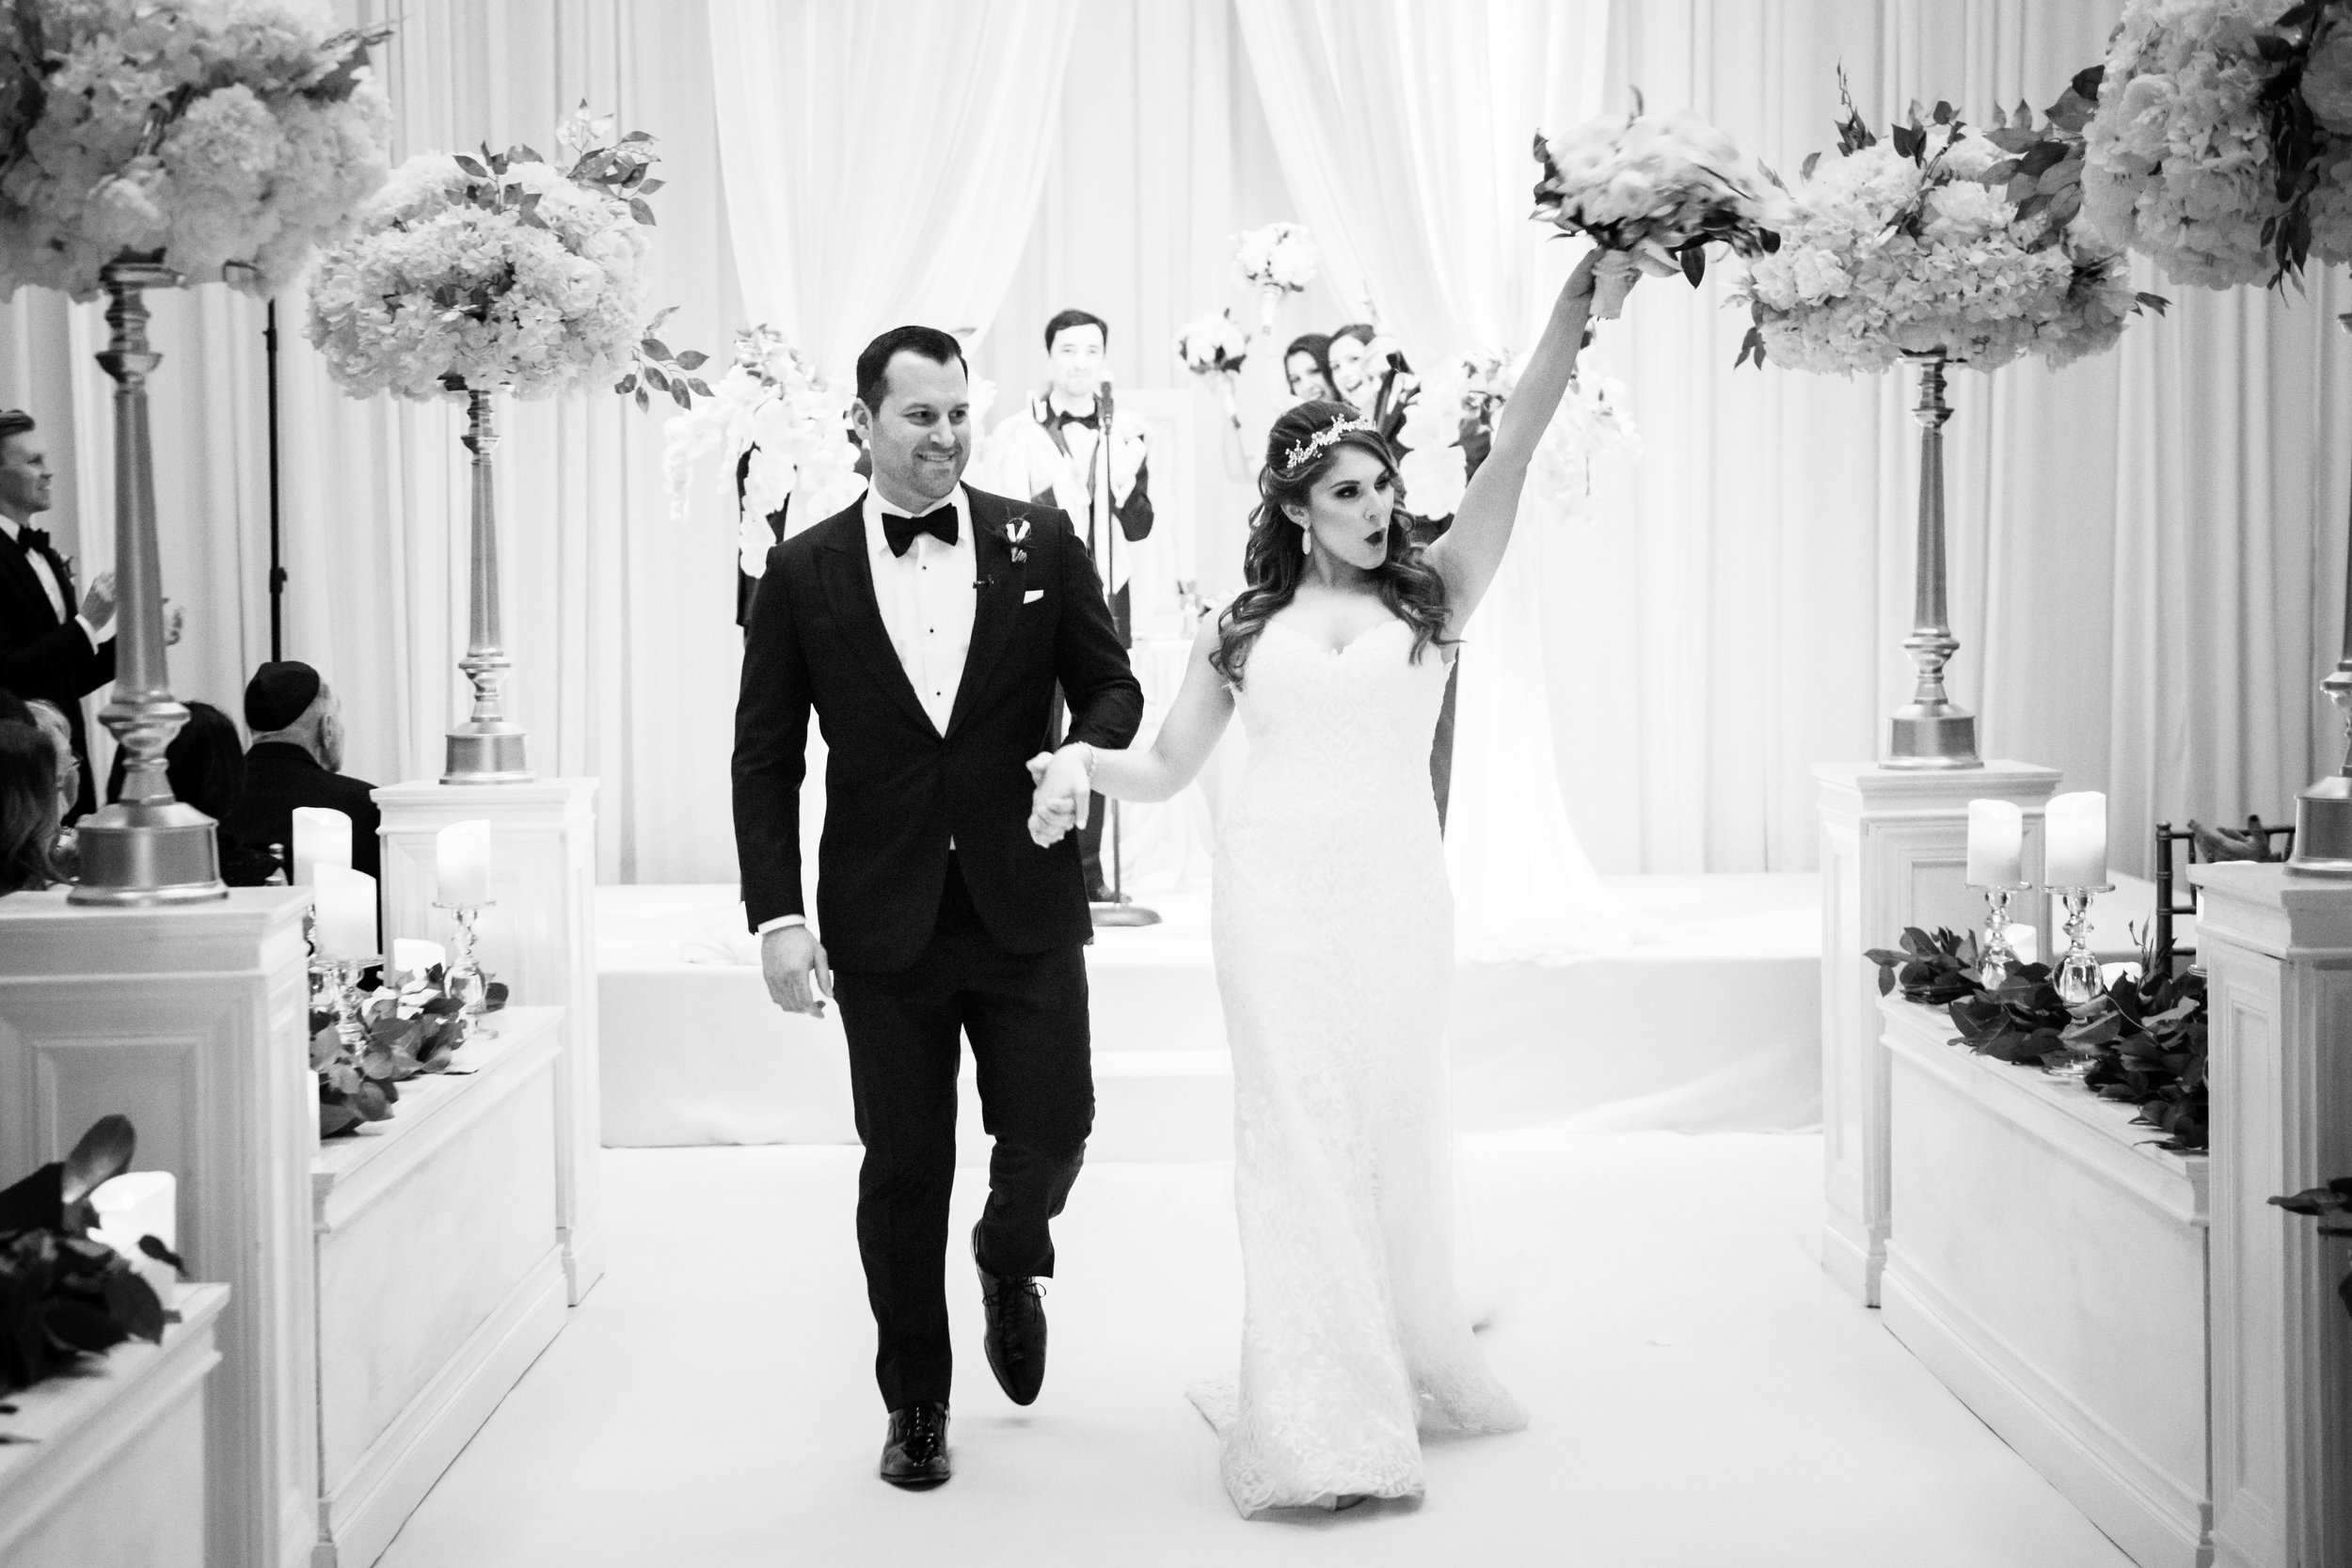 Elegant wedding at the JW Marriott Chicago22.jpg